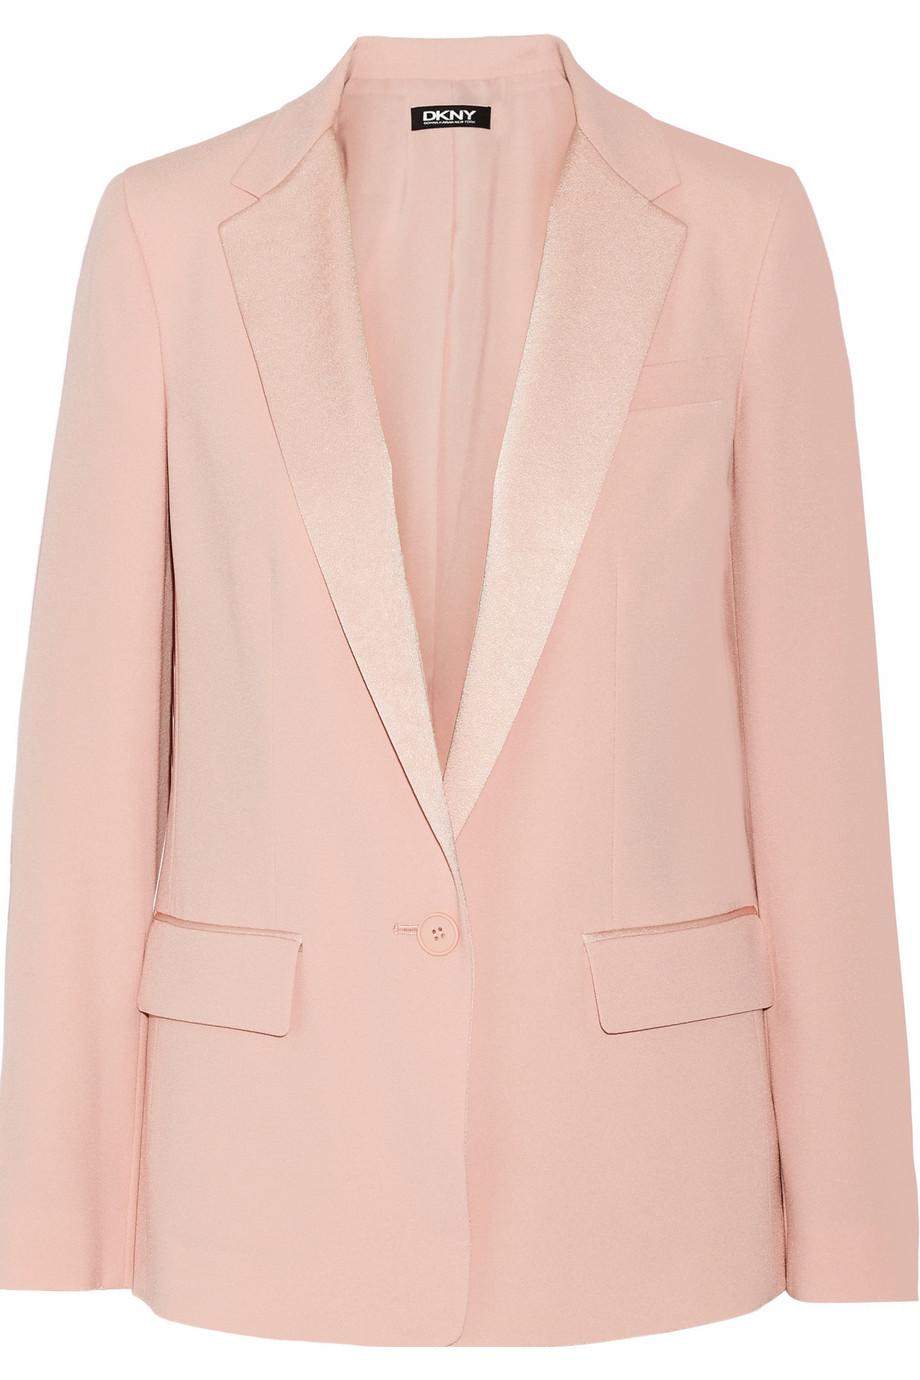 DKNY - Satin-trimmed crepe blazer - €390